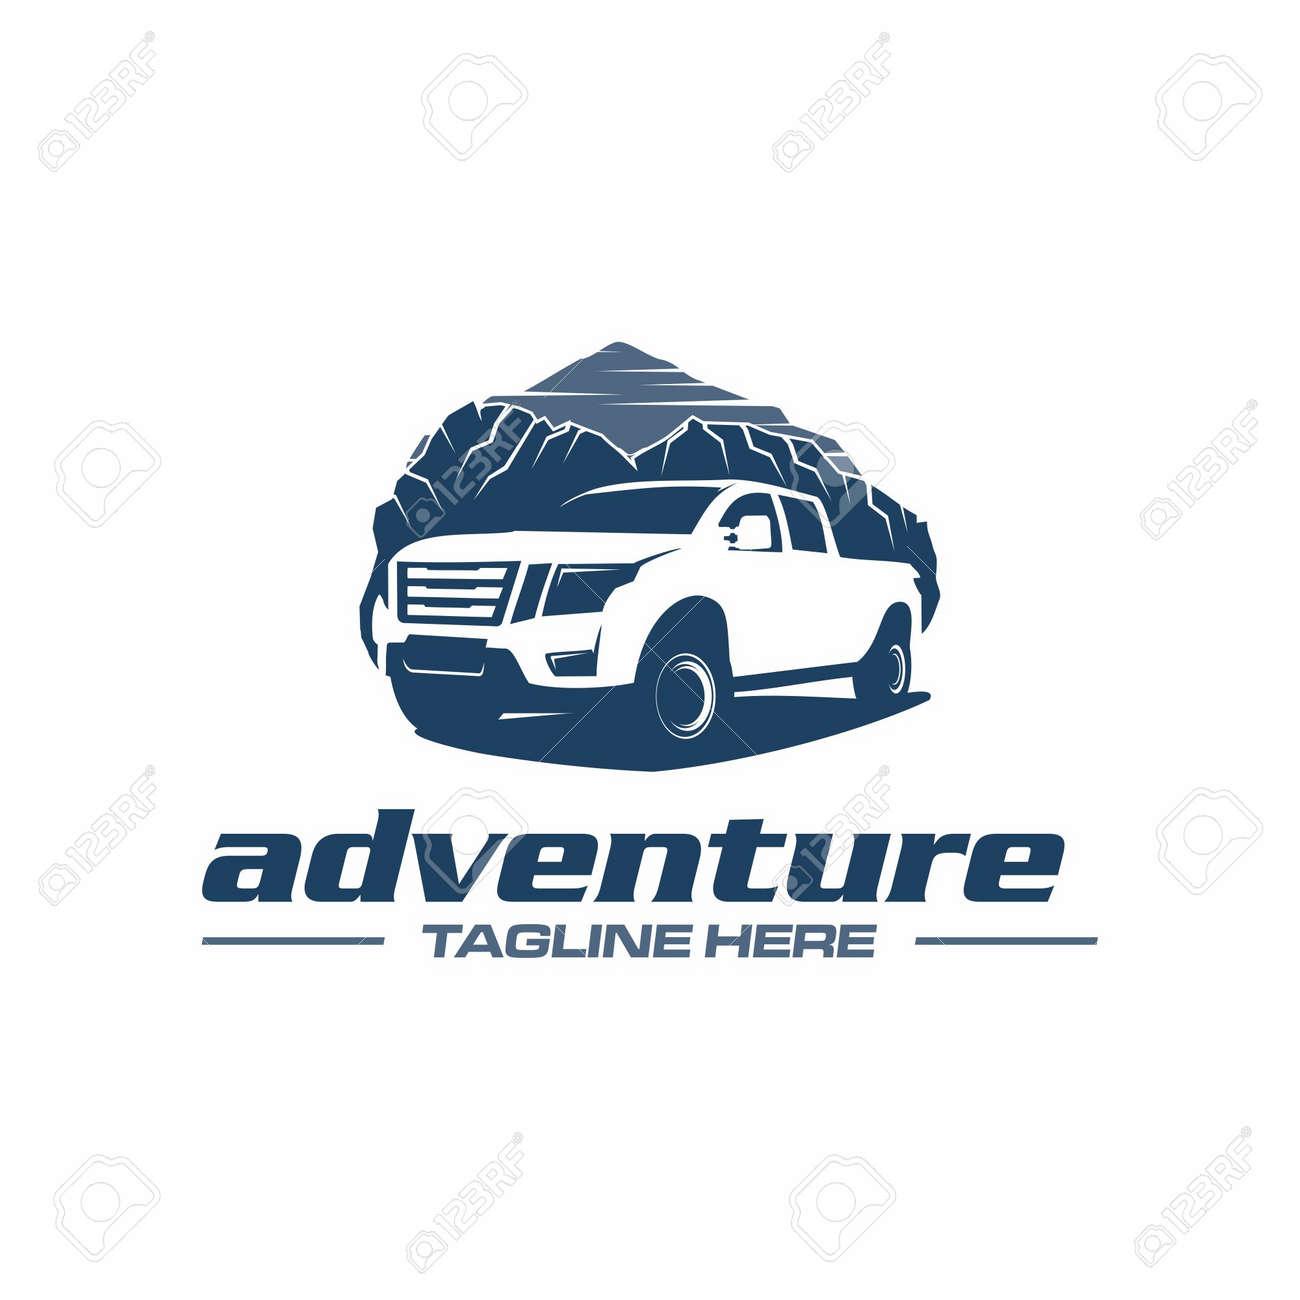 pickup truck adventure - 118640682